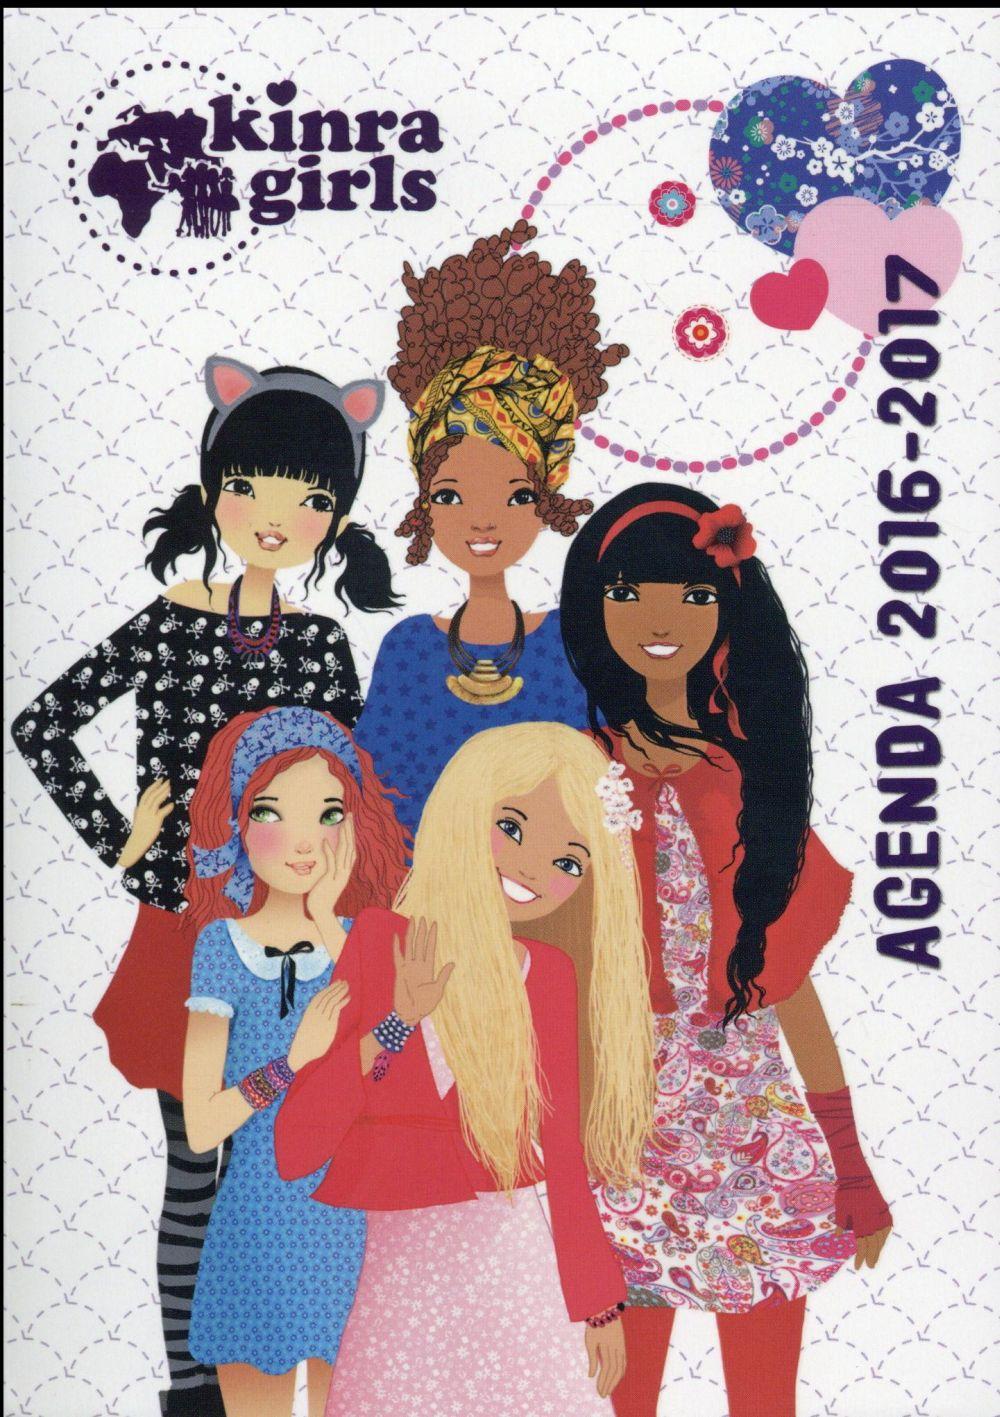 KINRA GIRLS - AGENDA 2016-2017